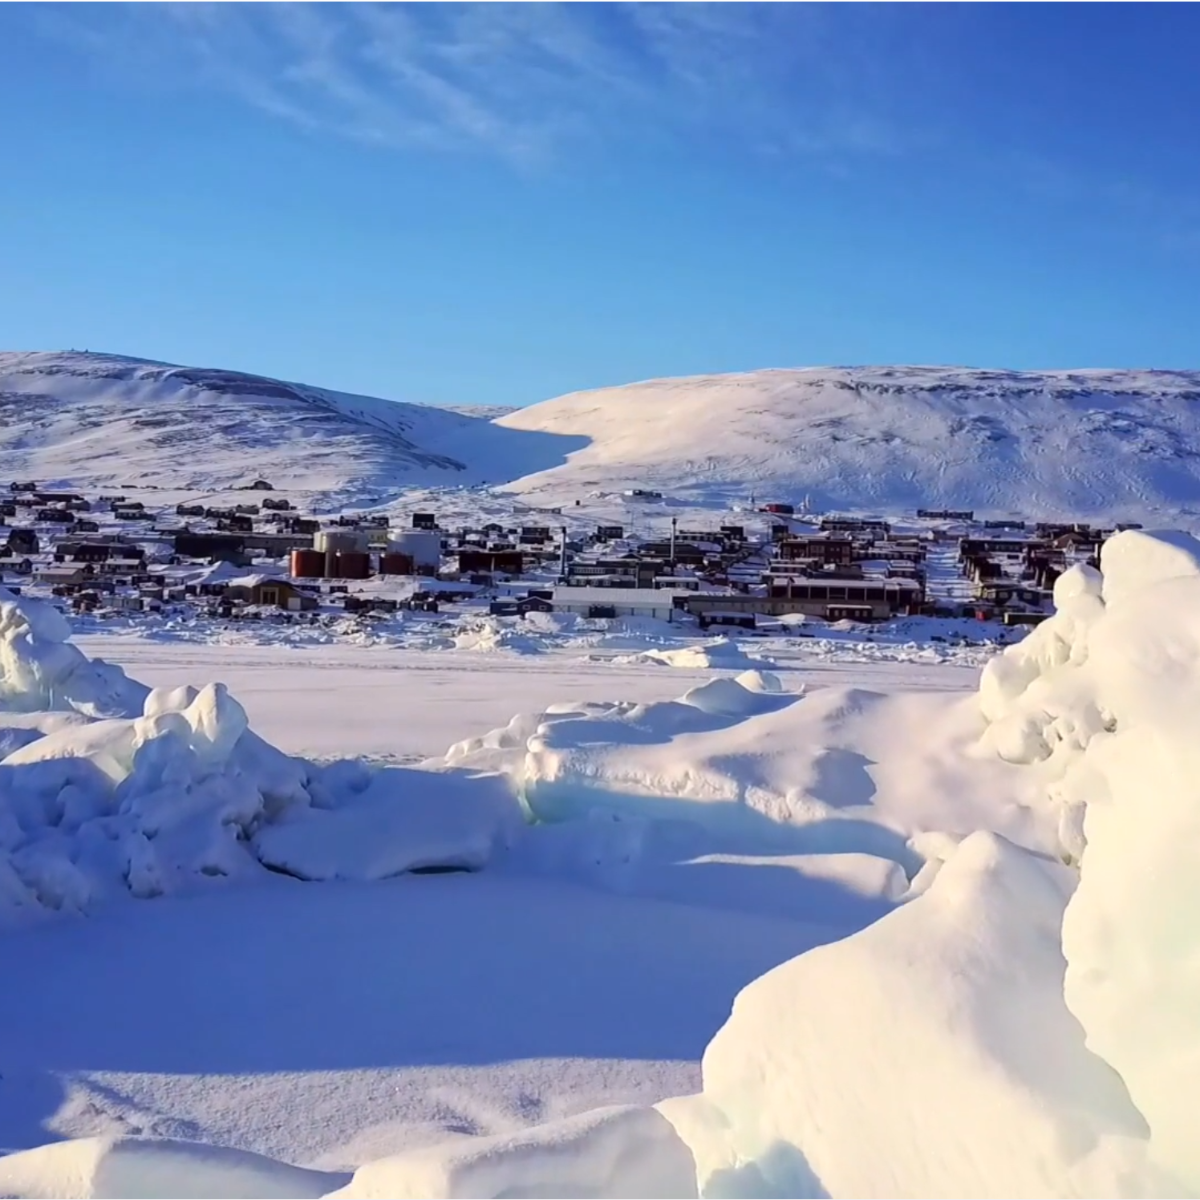 Arctic town